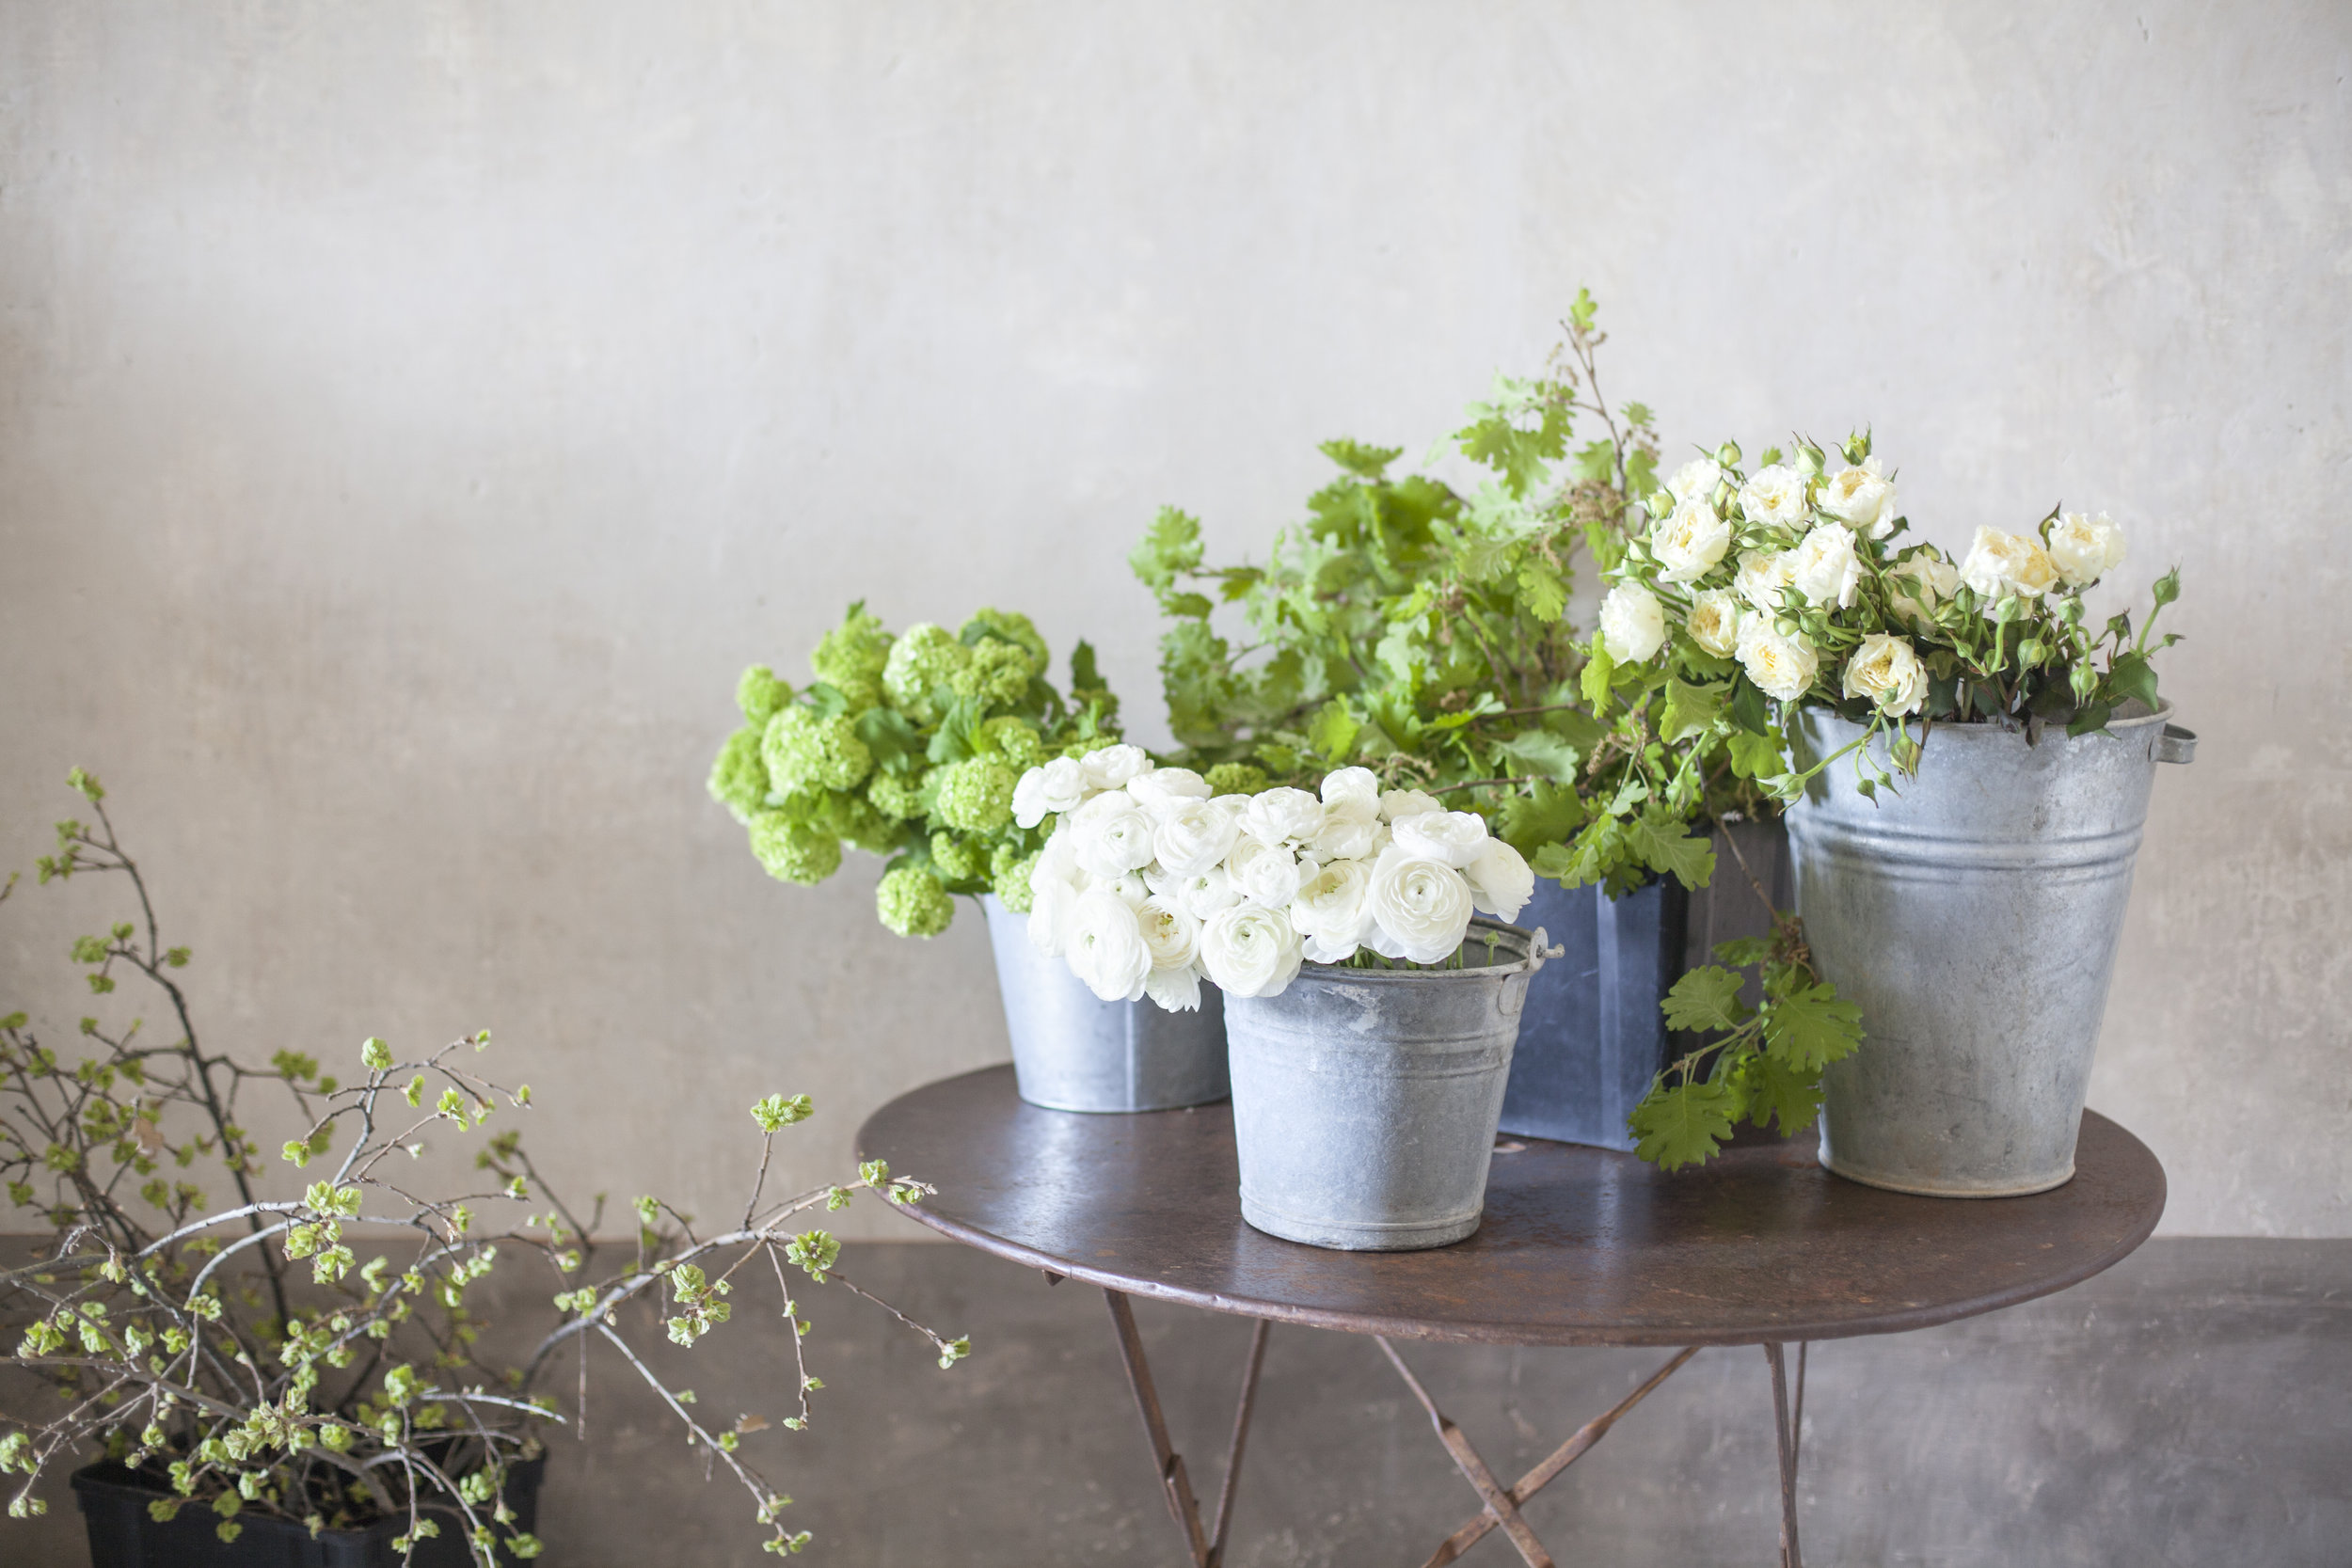 france-provence-floral-workshop-sandra-sigman-sharon-santoni (25).jpg